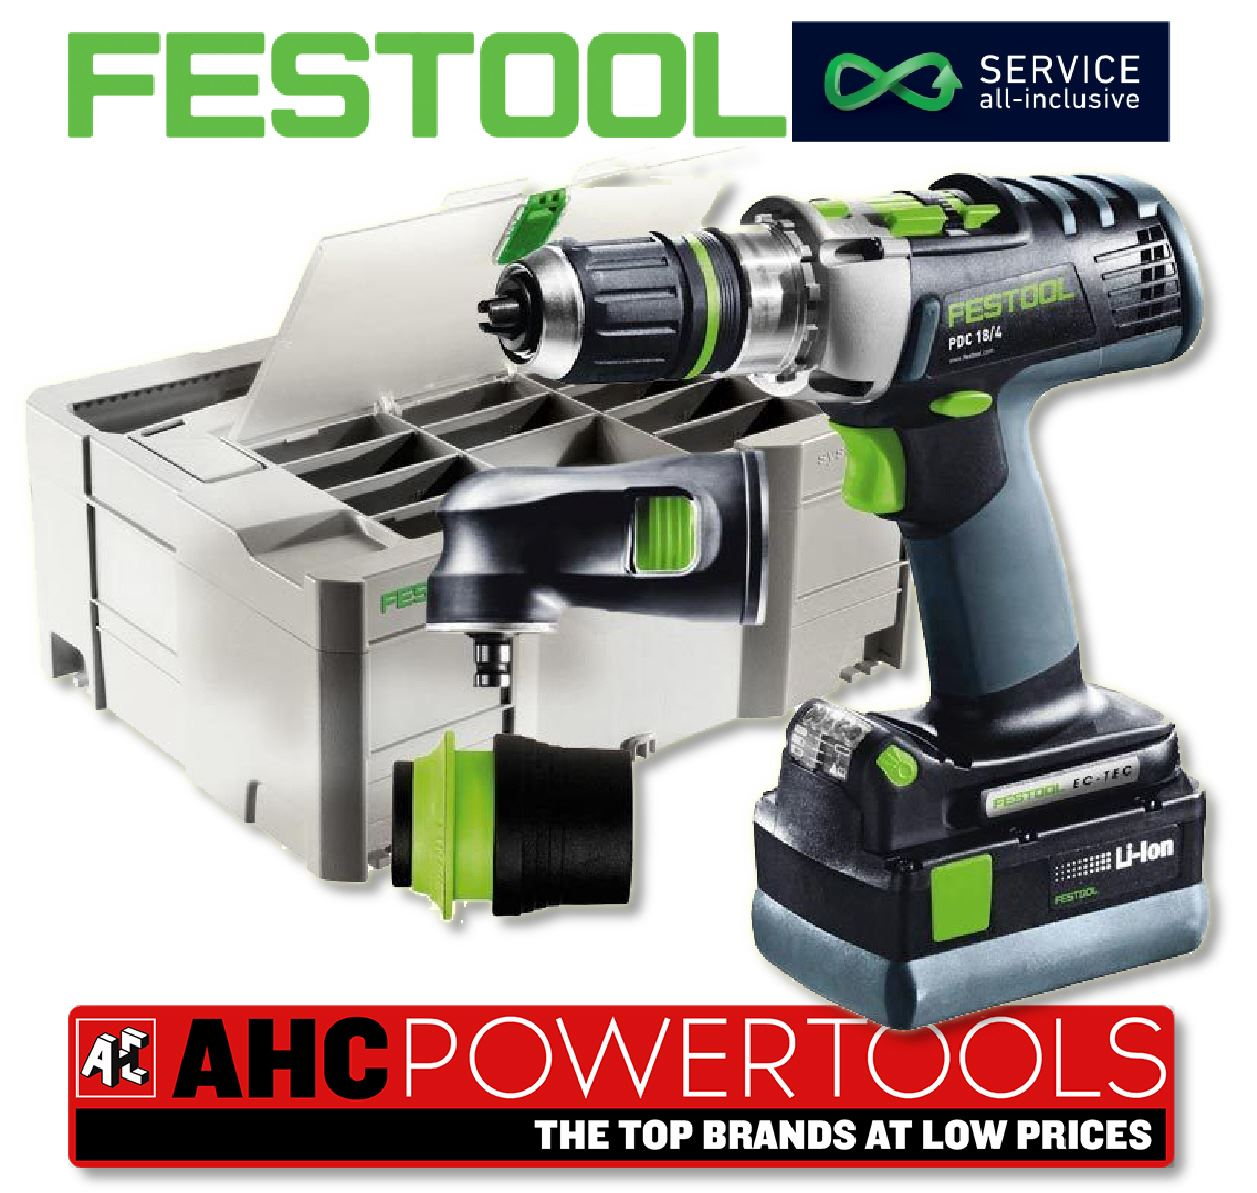 festool 18v quadrive pdc combi hammer drill set 2 x. Black Bedroom Furniture Sets. Home Design Ideas